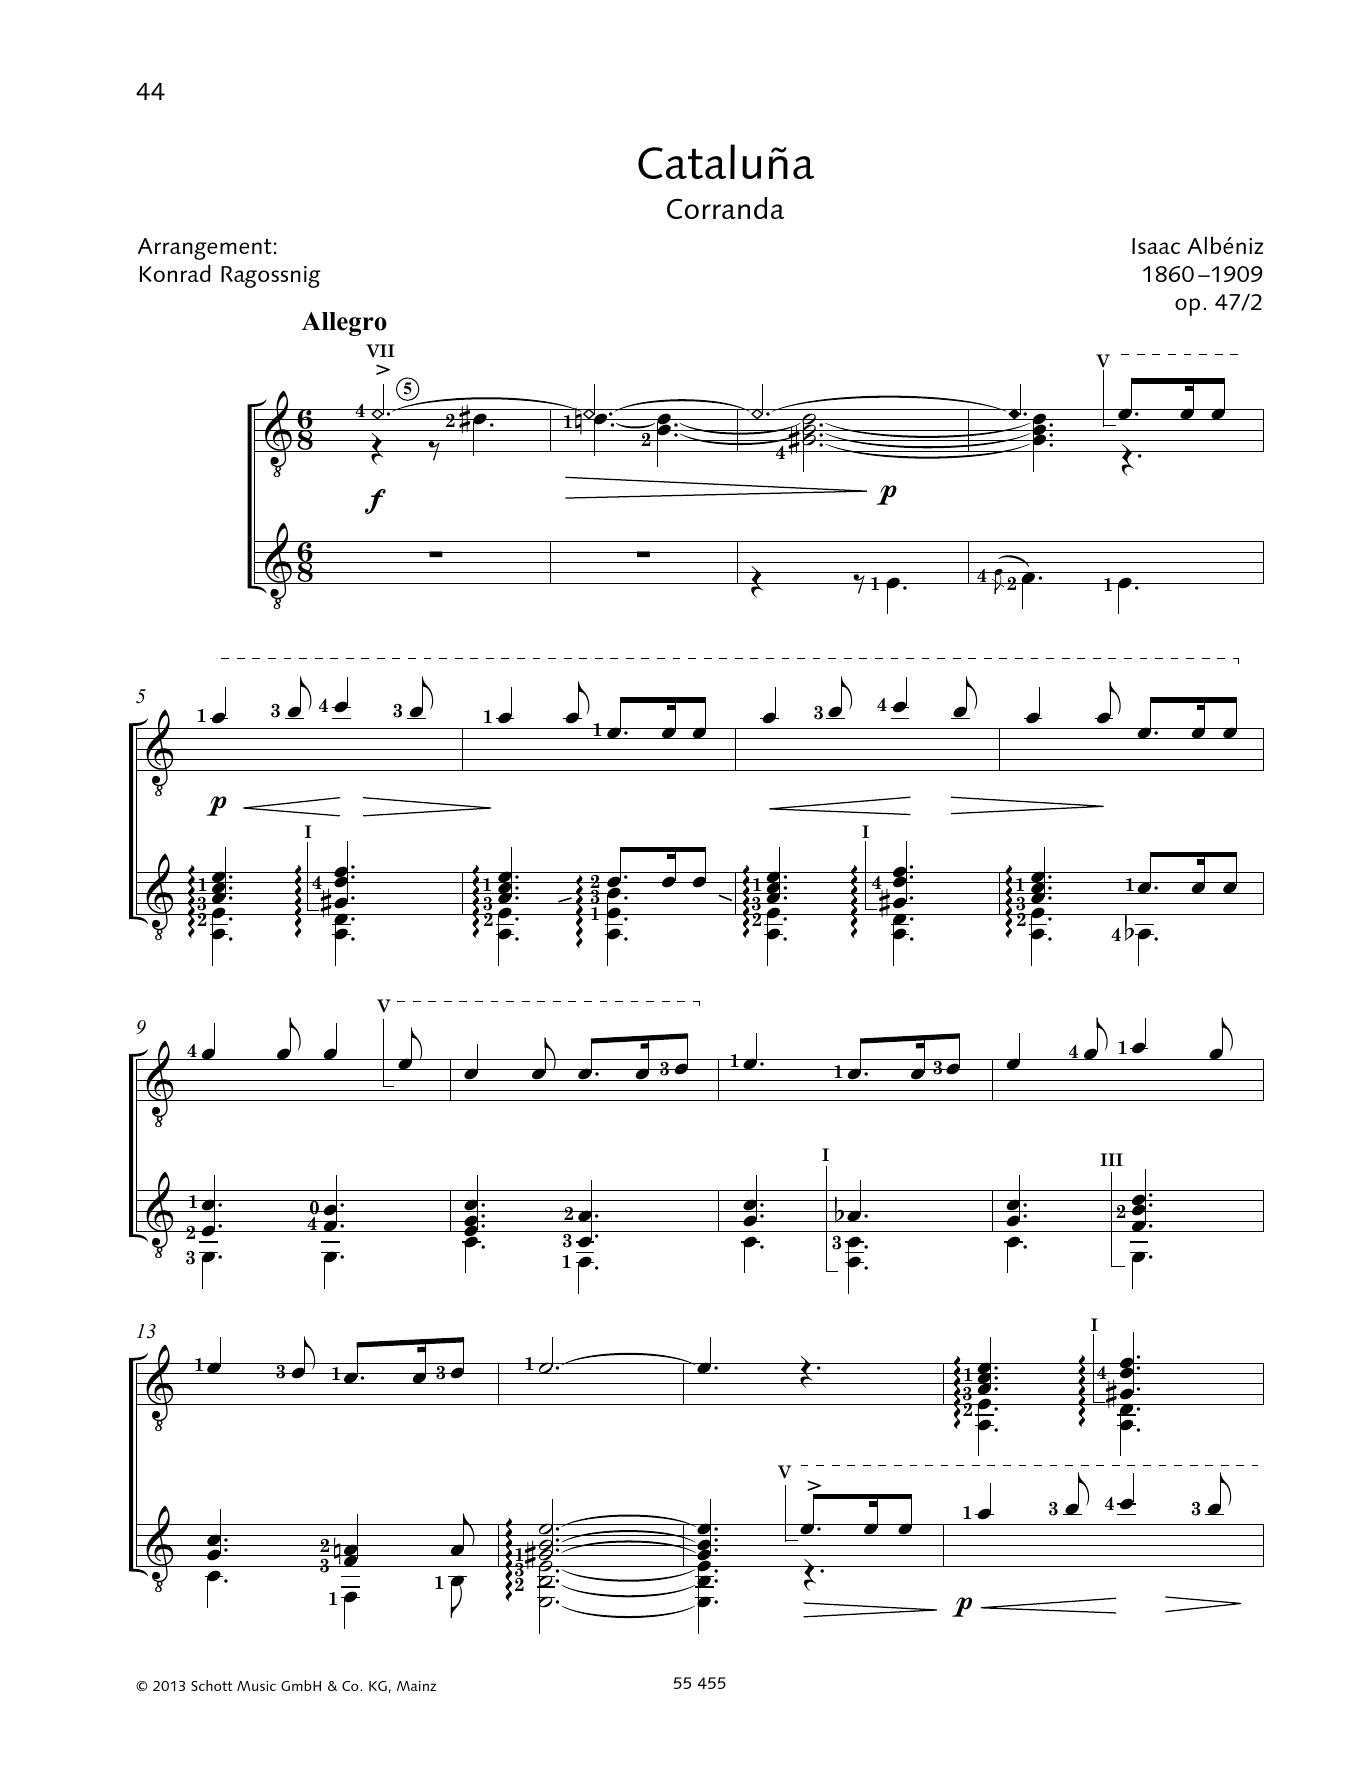 Cataluna (Corranda) - Full Score Sheet Music